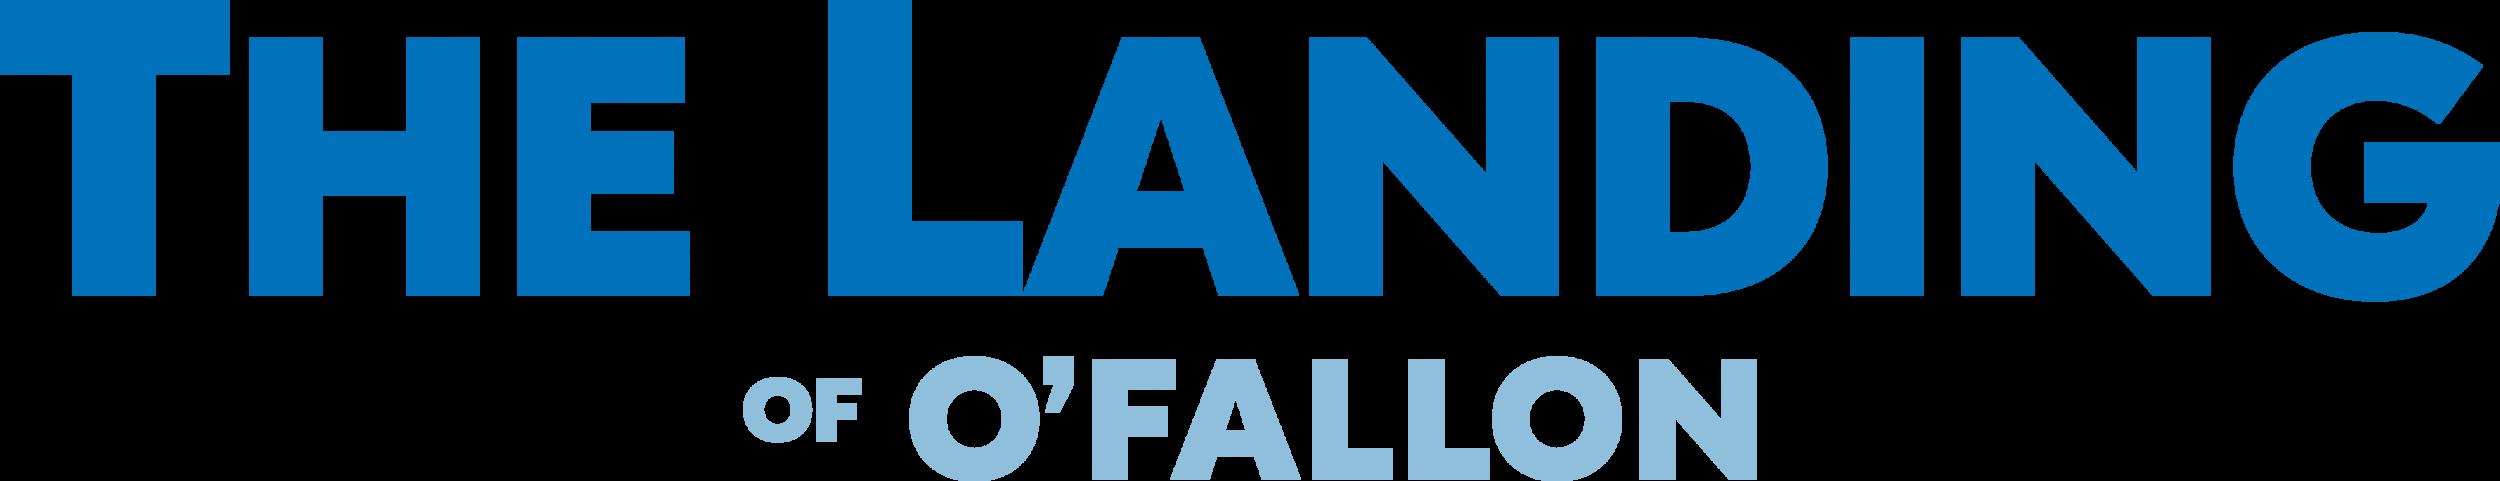 the-landing-of-ofallon-logo.png